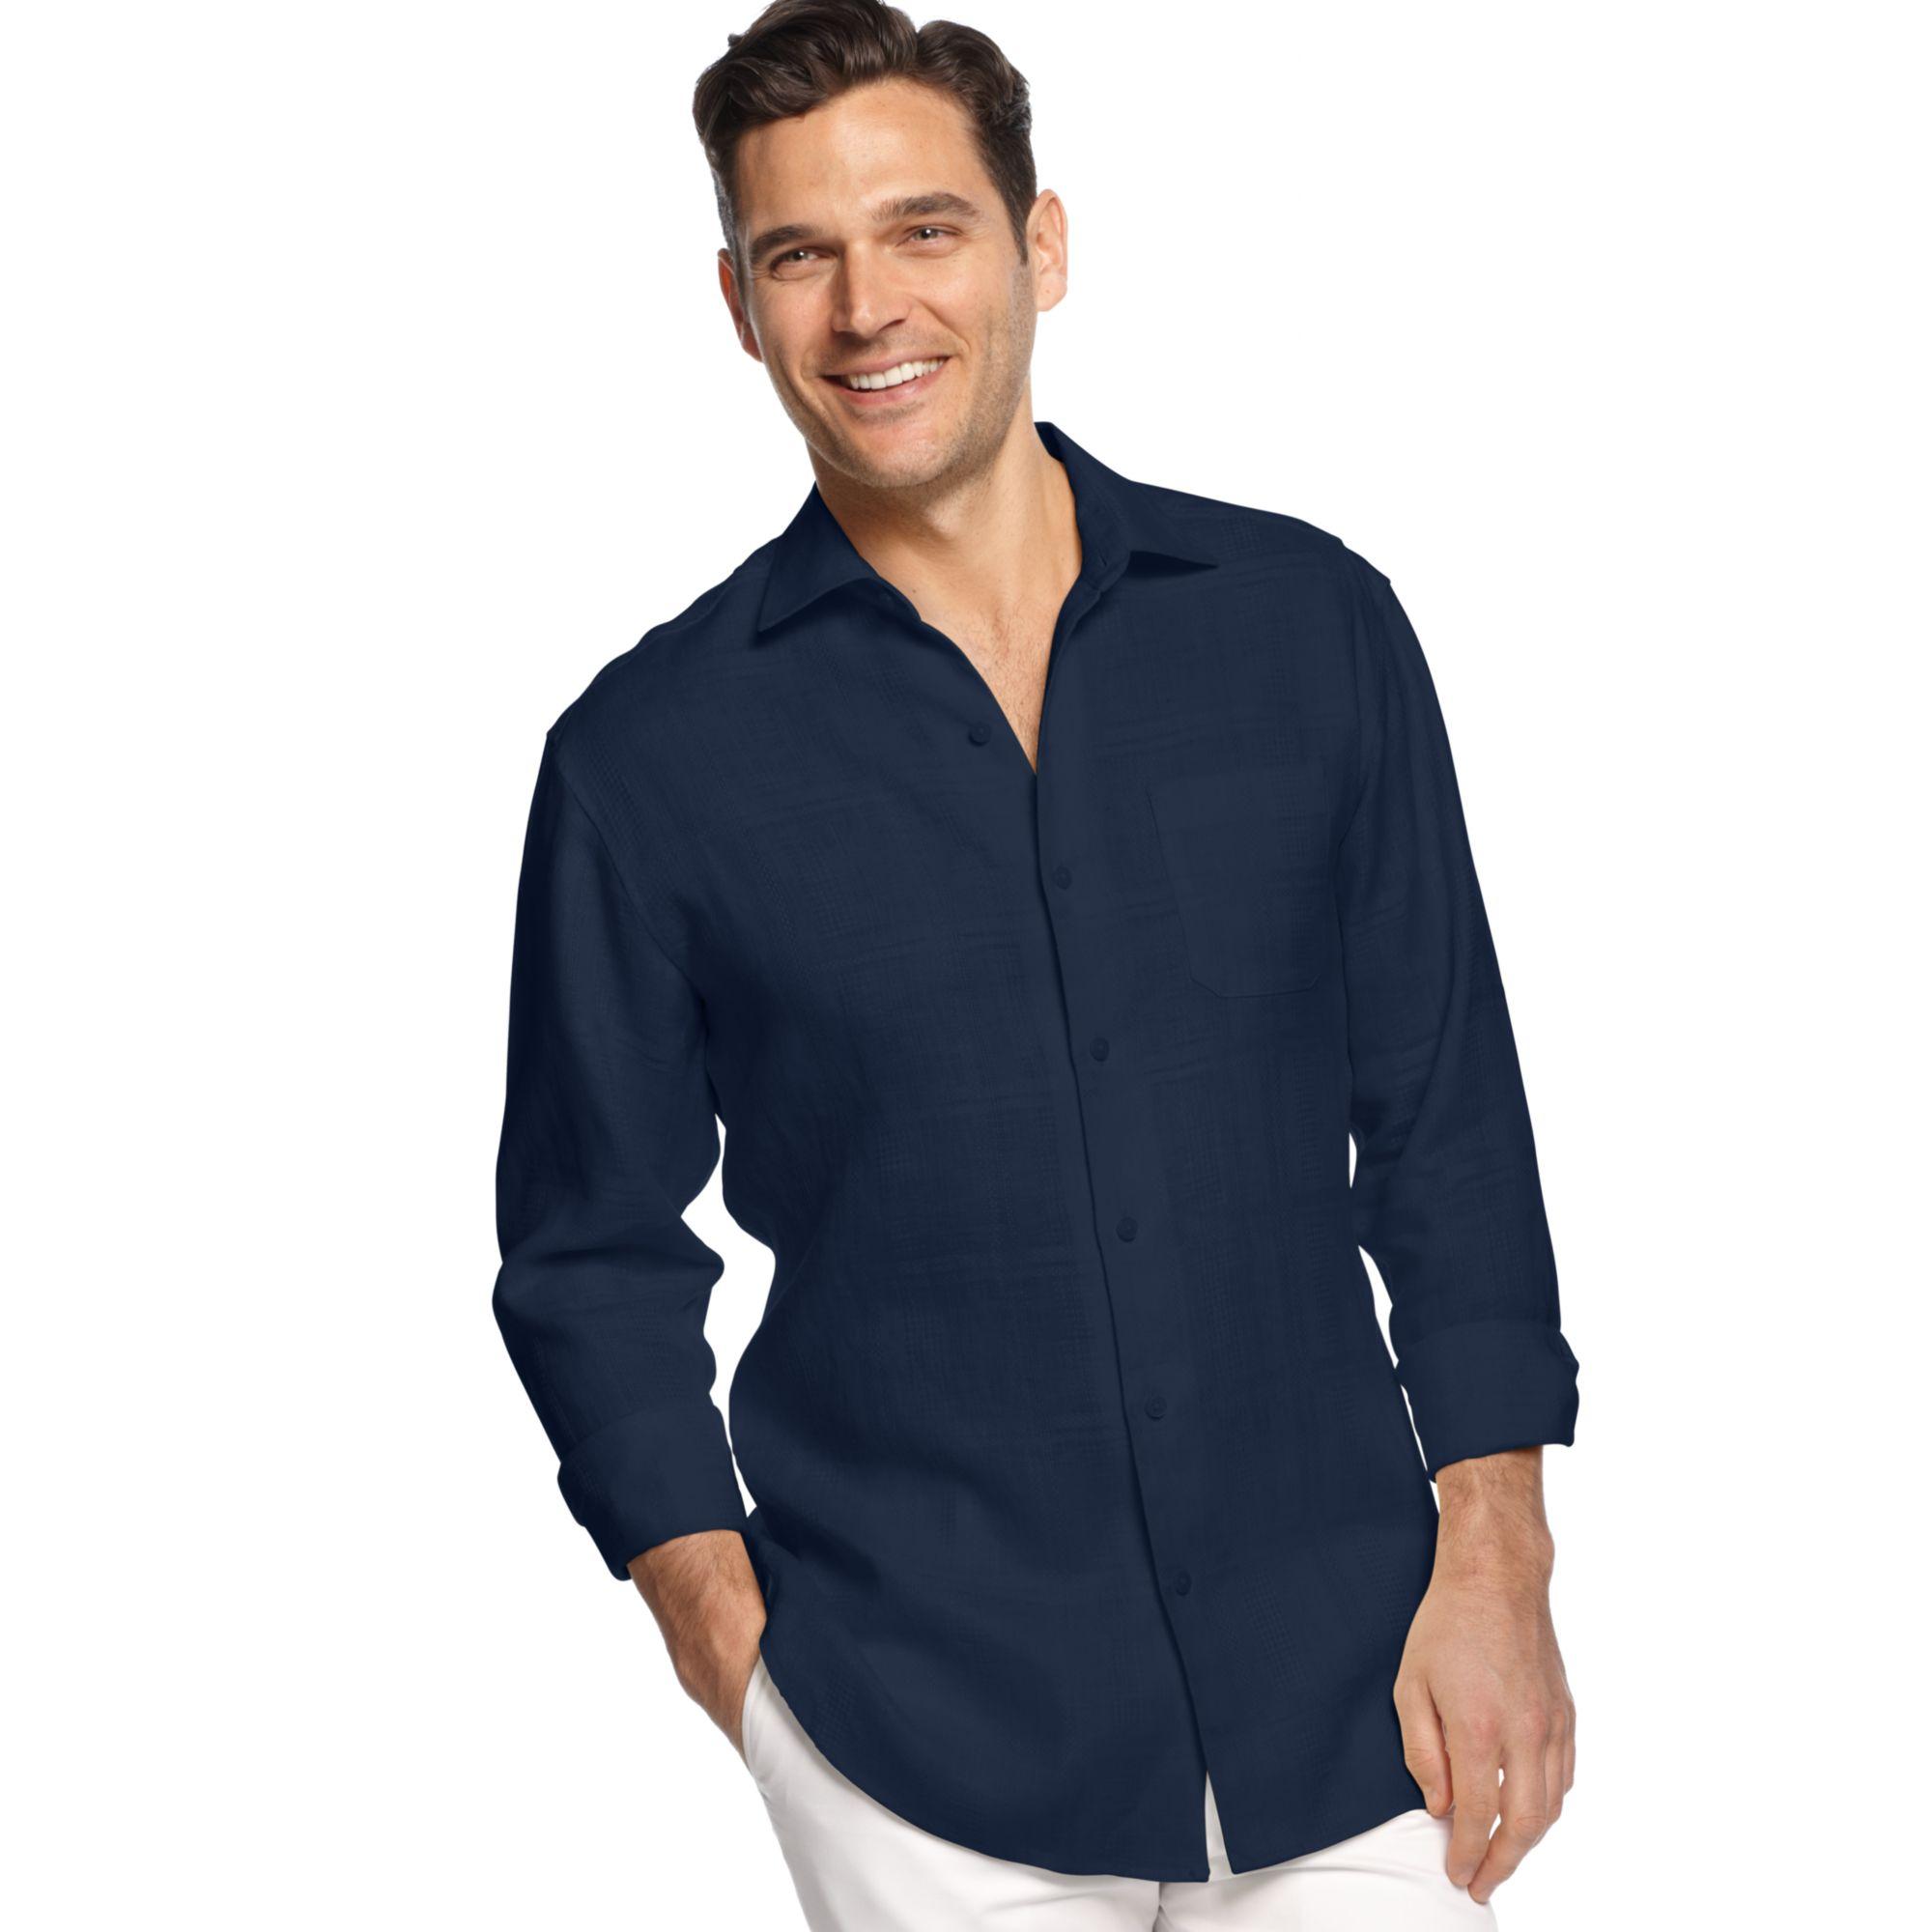 Tommy bahama long sleeve monte carlo linen shirt in blue for Tommy bahama long sleeve dress shirts